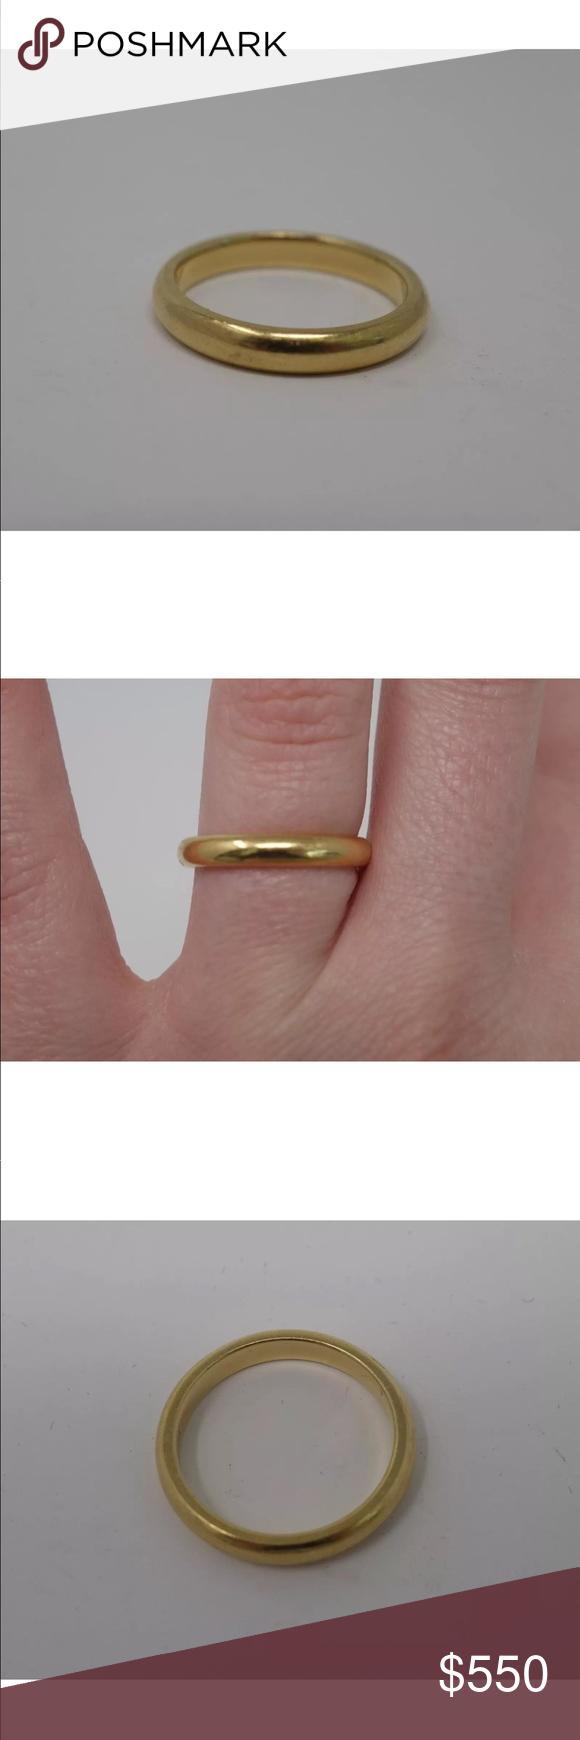 TIFFANY & CO. 18K Yellow Gold Wedding Band Ring 18k